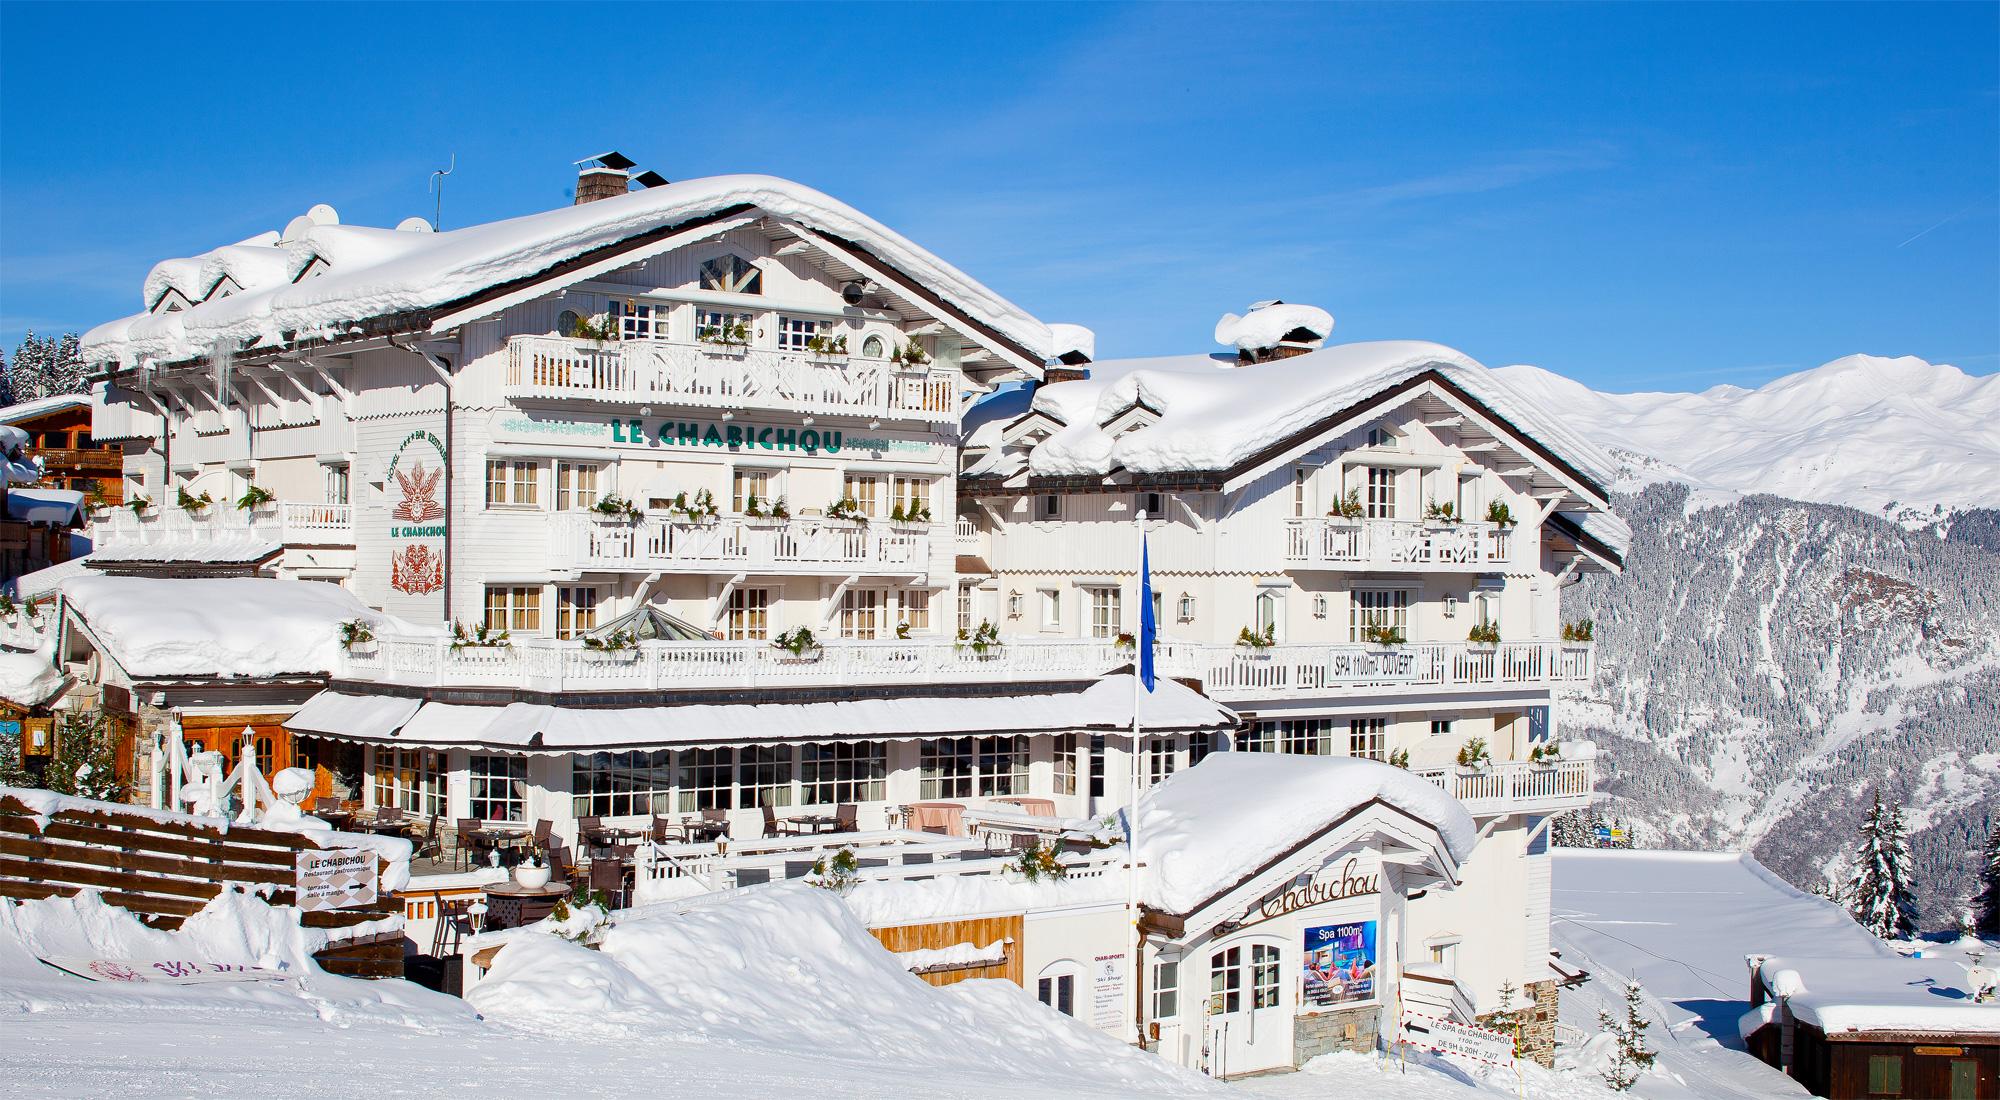 Five-star mountain resort luxury at Le Chabichou Hôtel, Courchevel, France 10